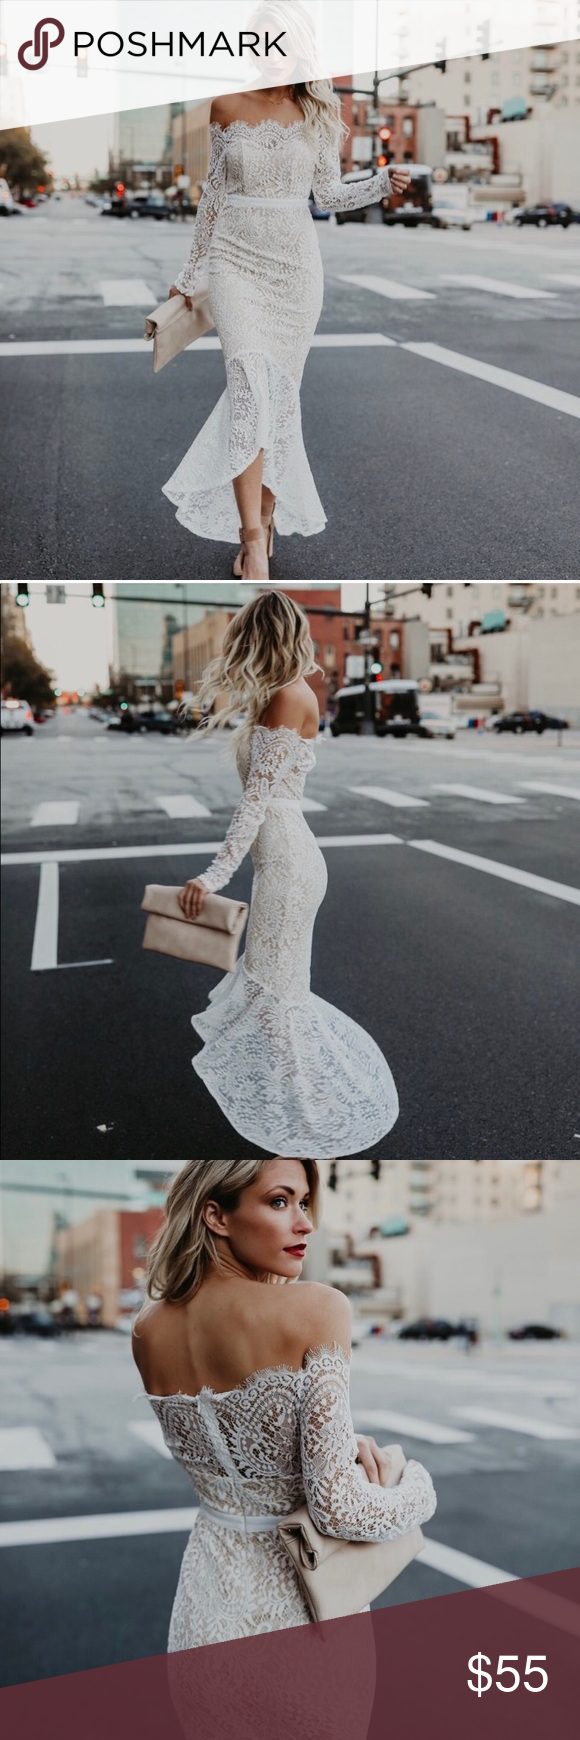 Nwt Vici White Lace Trumpet Dress Little White Dresses Trumpet Dress Dresses [ 1740 x 580 Pixel ]